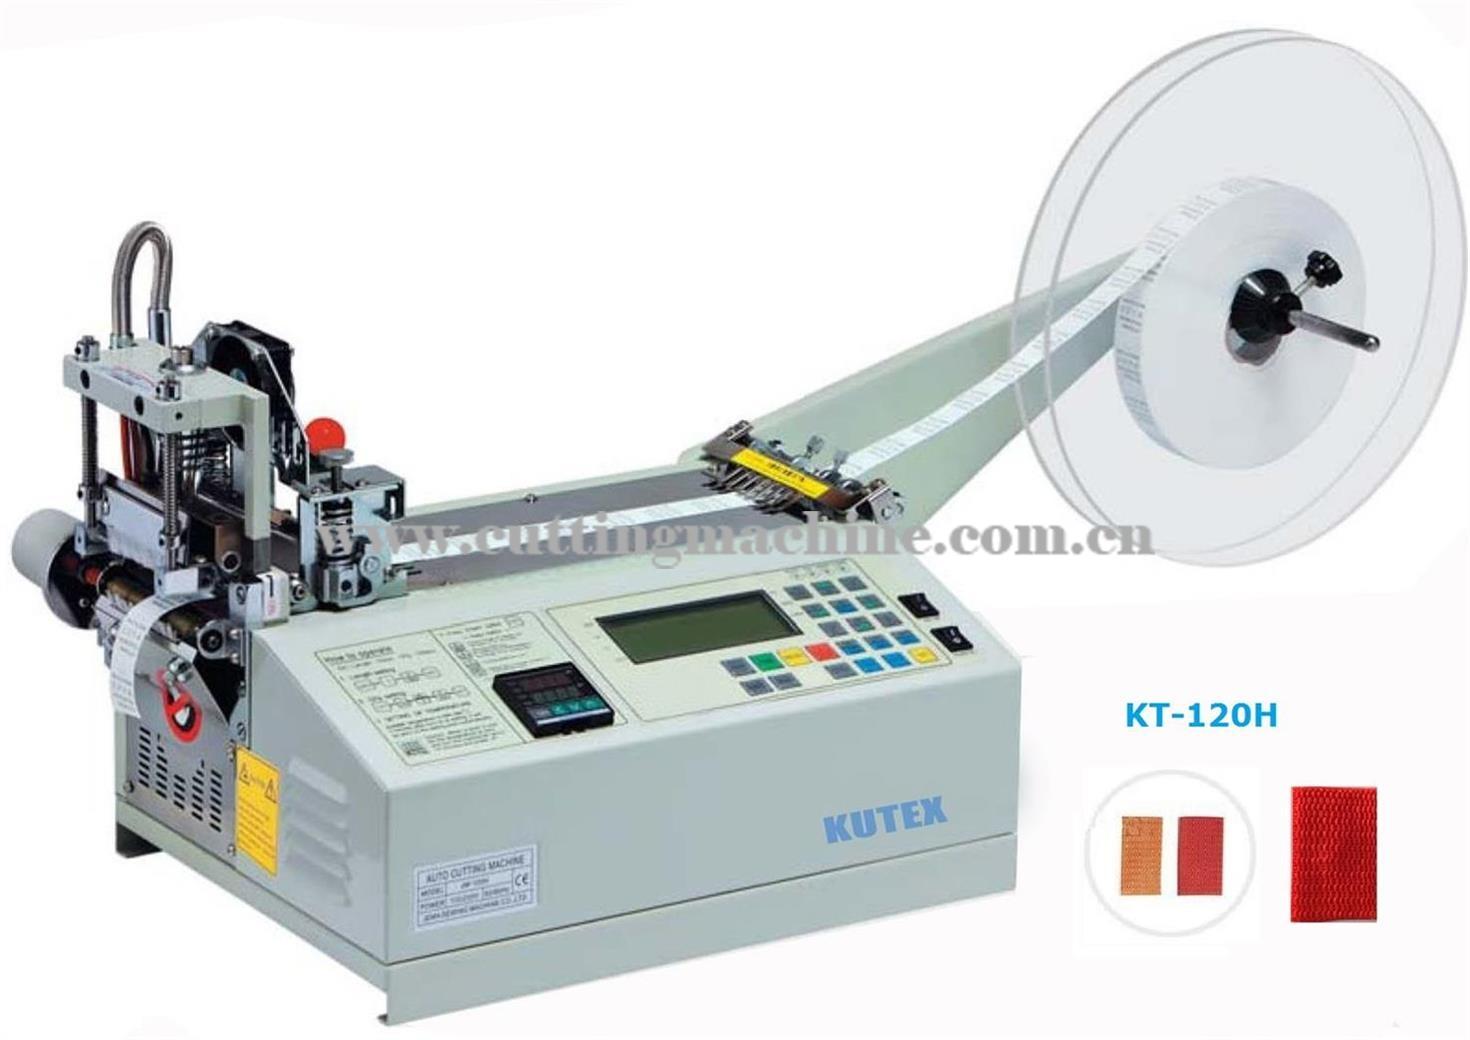 Hot Knife Automatic Tape Cutter